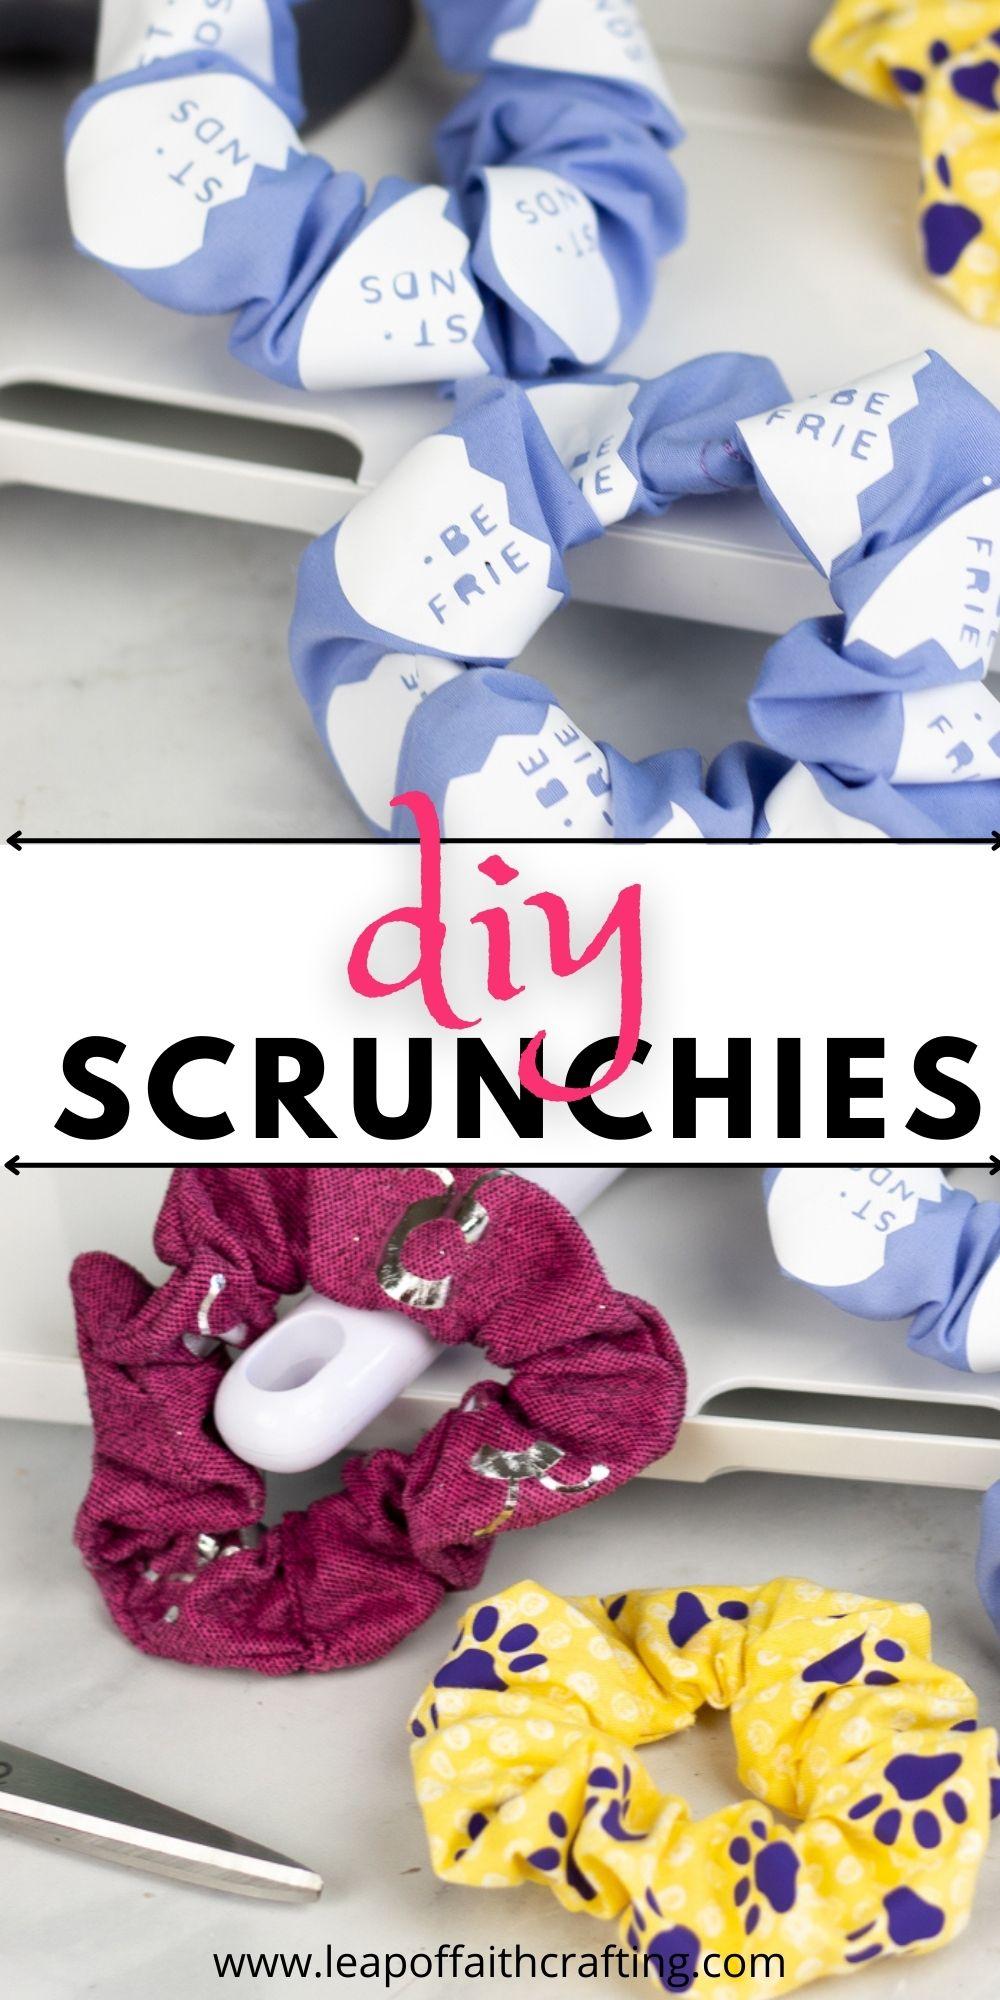 diy scrunchies tutorial